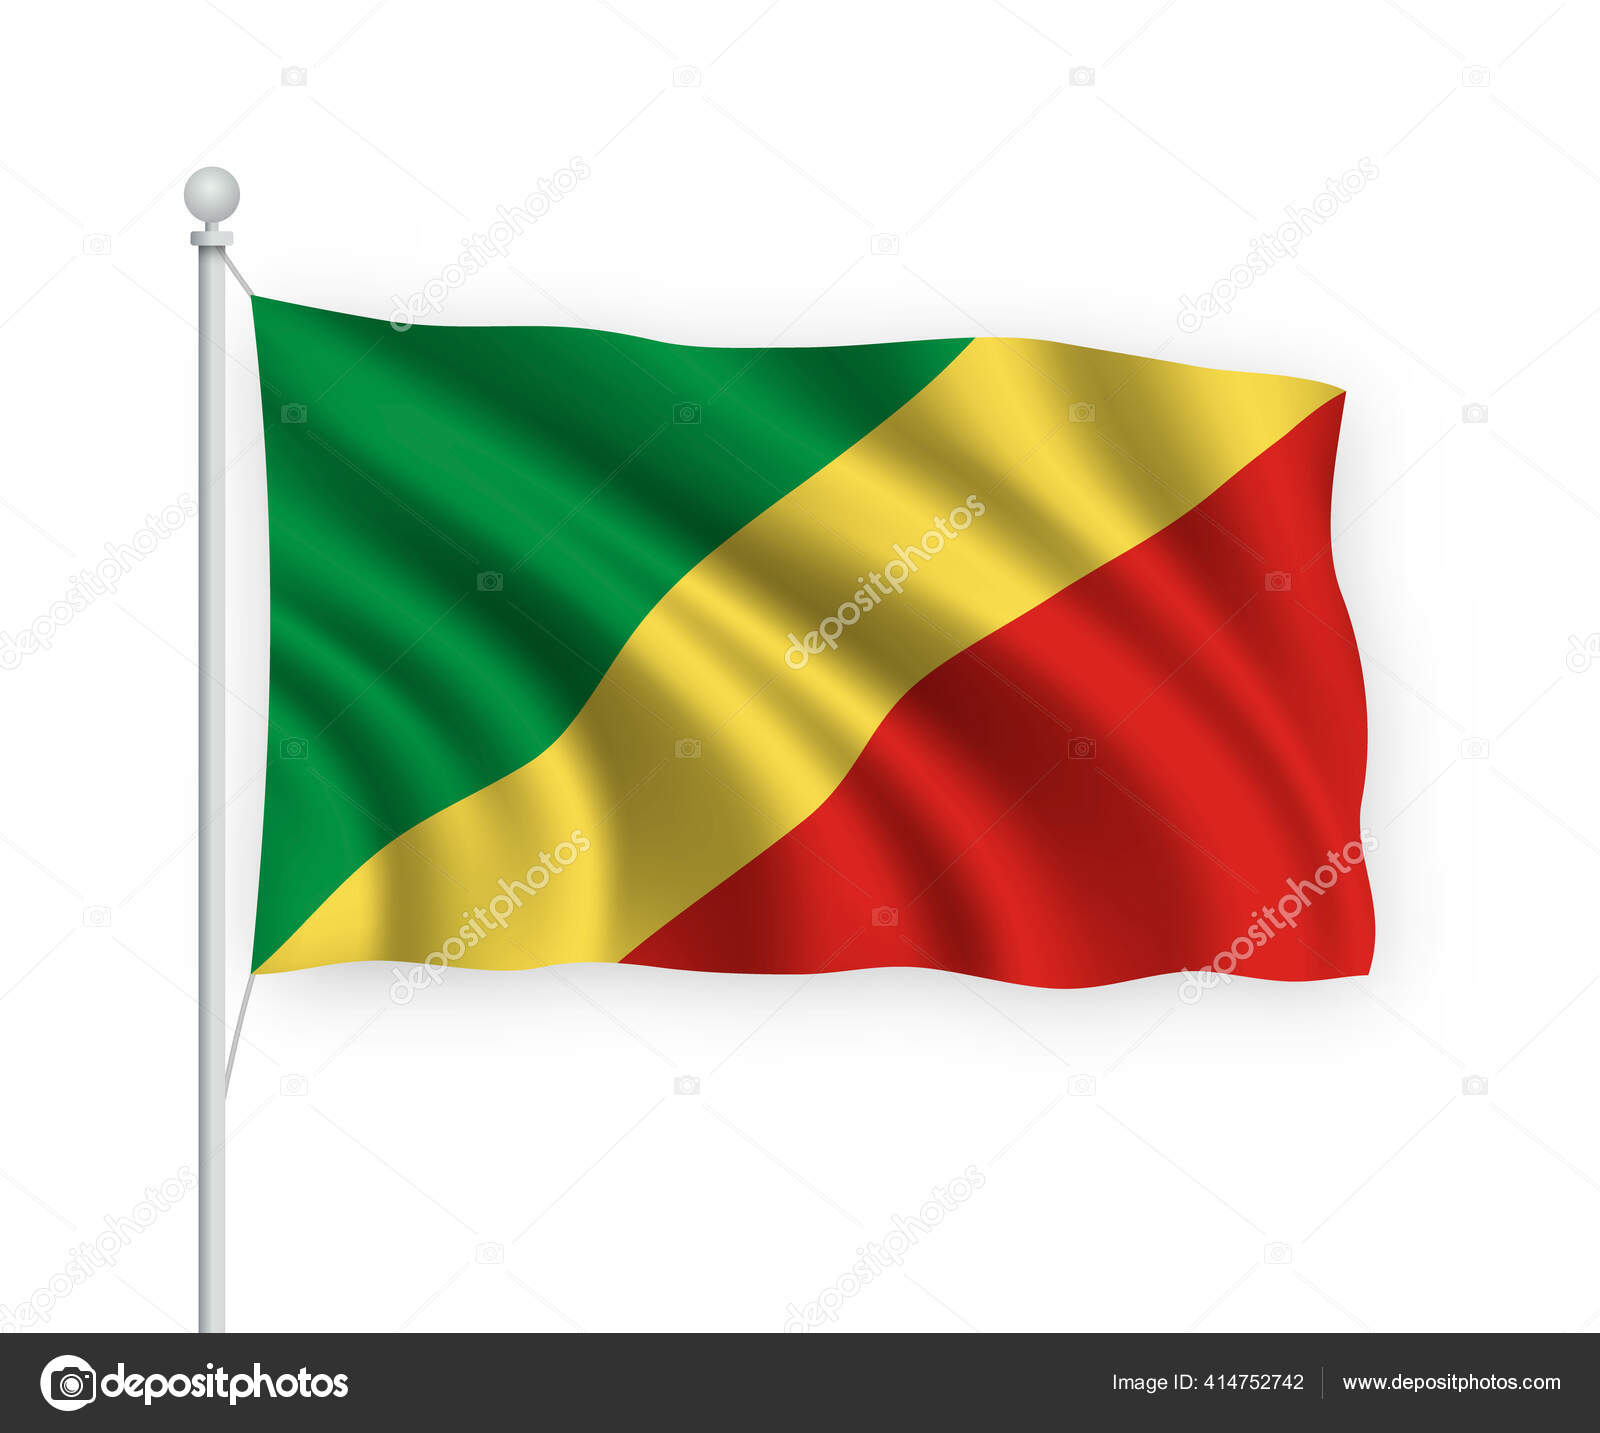 Bandera Ondeante República Congo Asta Bandera Aislado Sobre Fondo Blanco Vector De Stock Grebeshkovmaxim Gmail Com 414752742